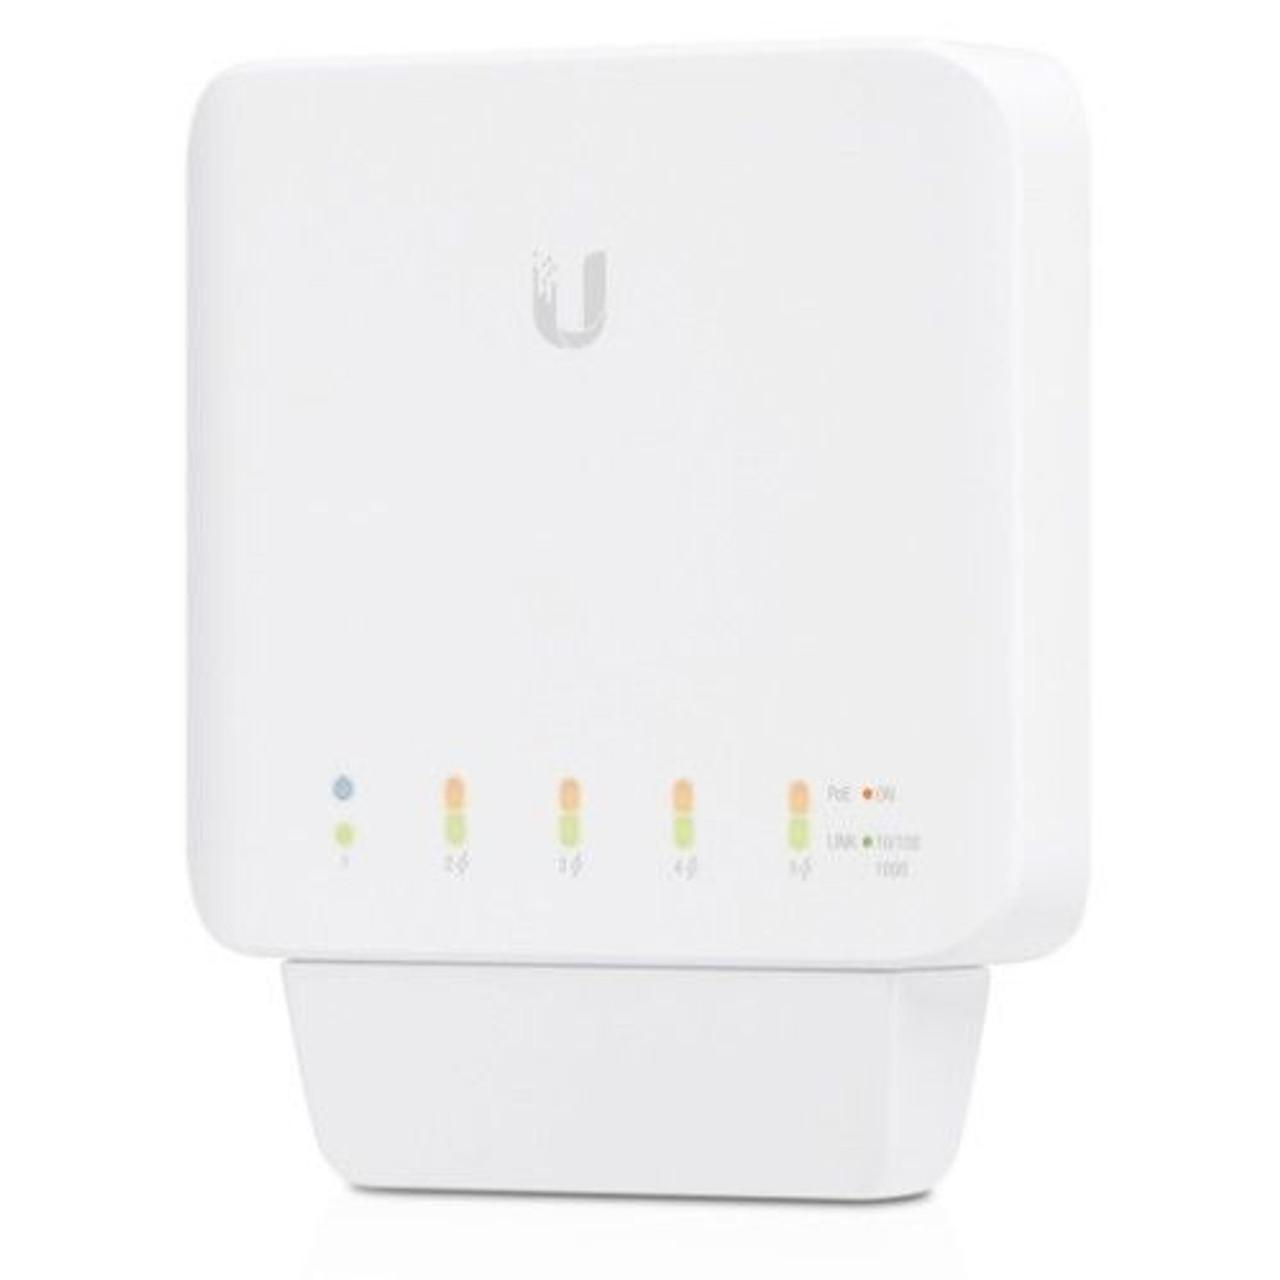 UniFi Indoor/outdoor 5Port Poe Gigabit Switch with 802.3bt Input Power Support